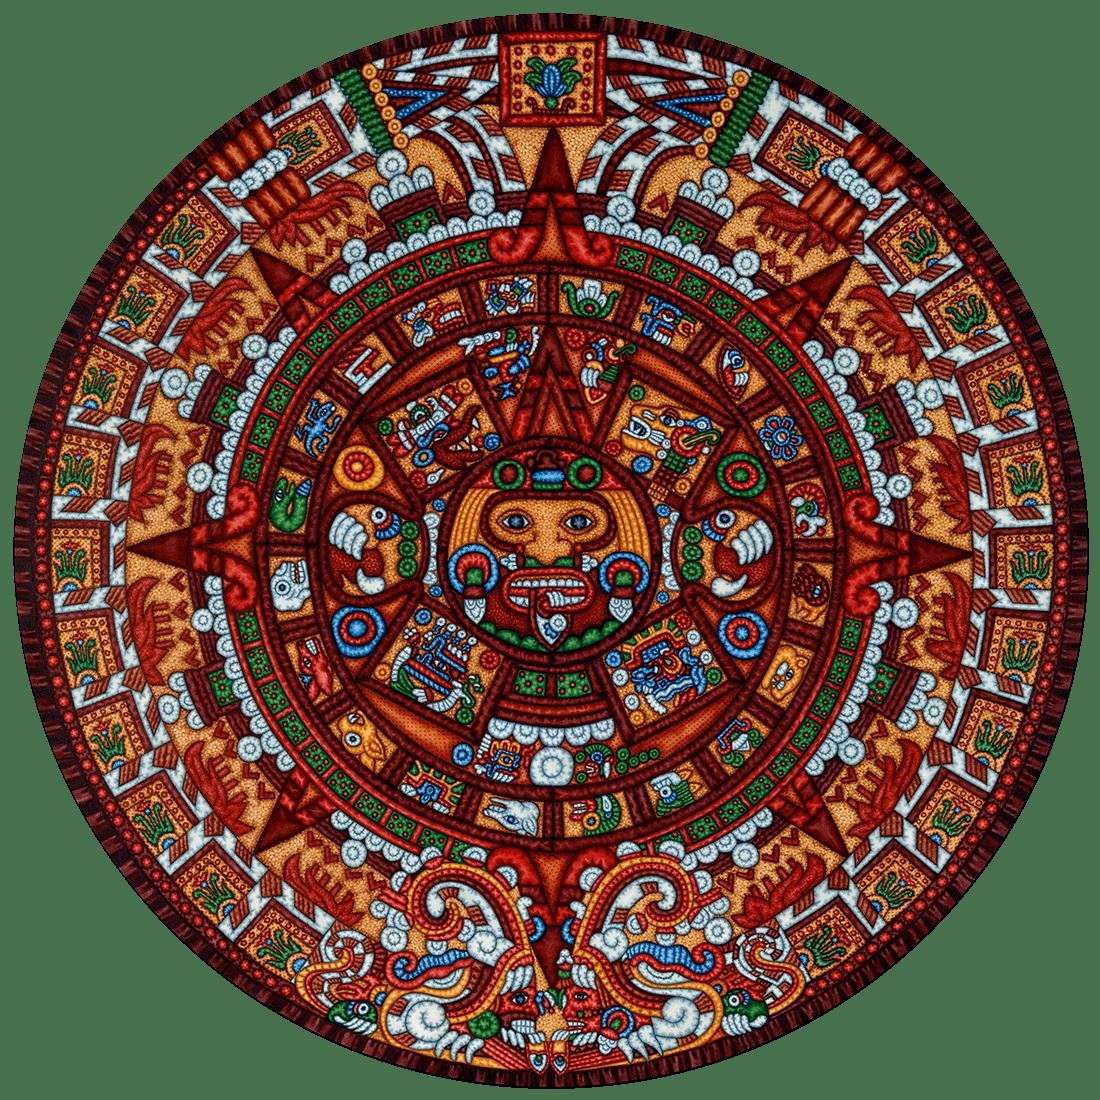 Aztec Calendar Wallpapers